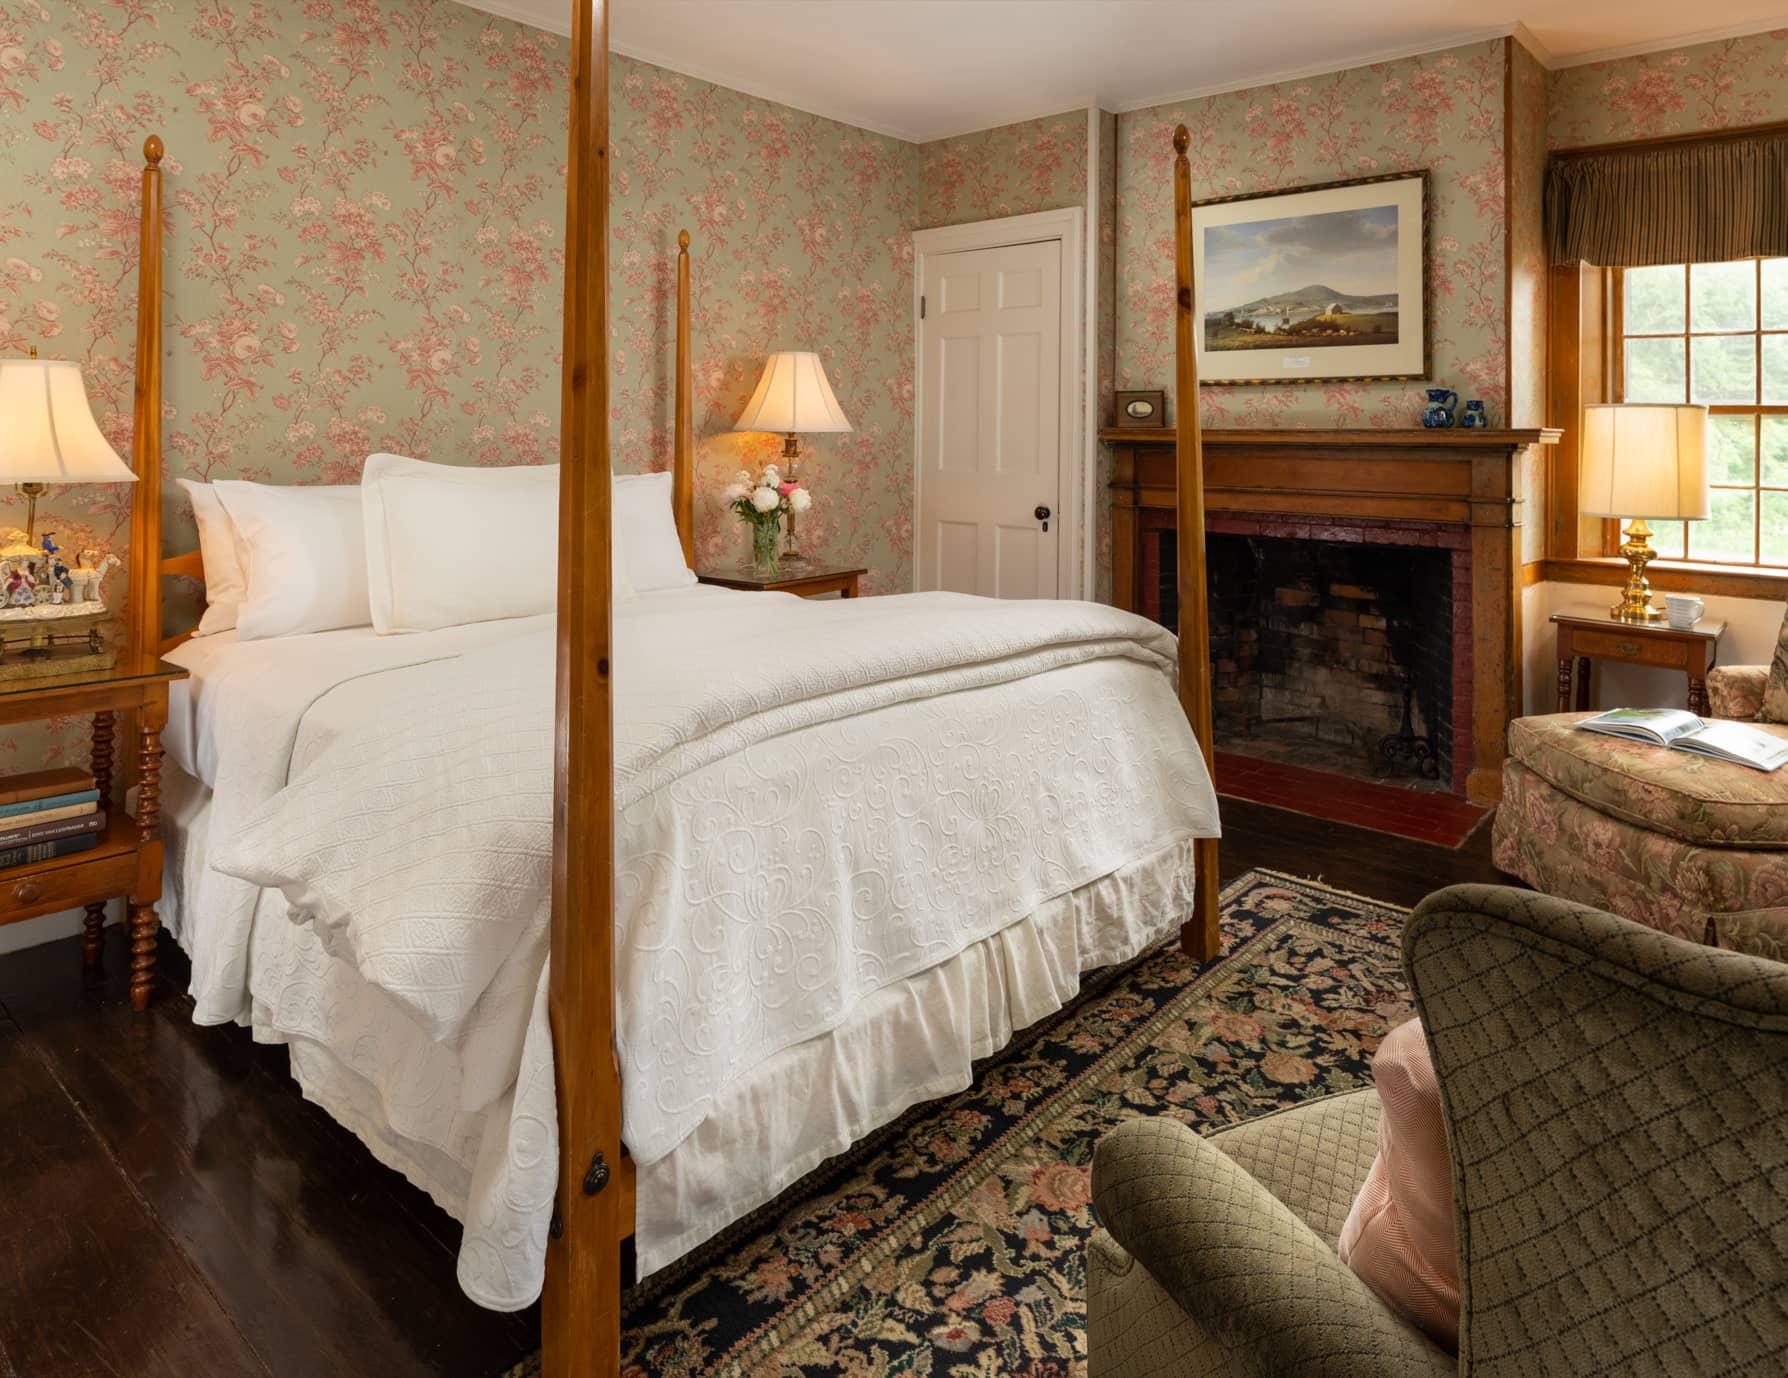 Room 11, a Maine Coast B&B Getaway